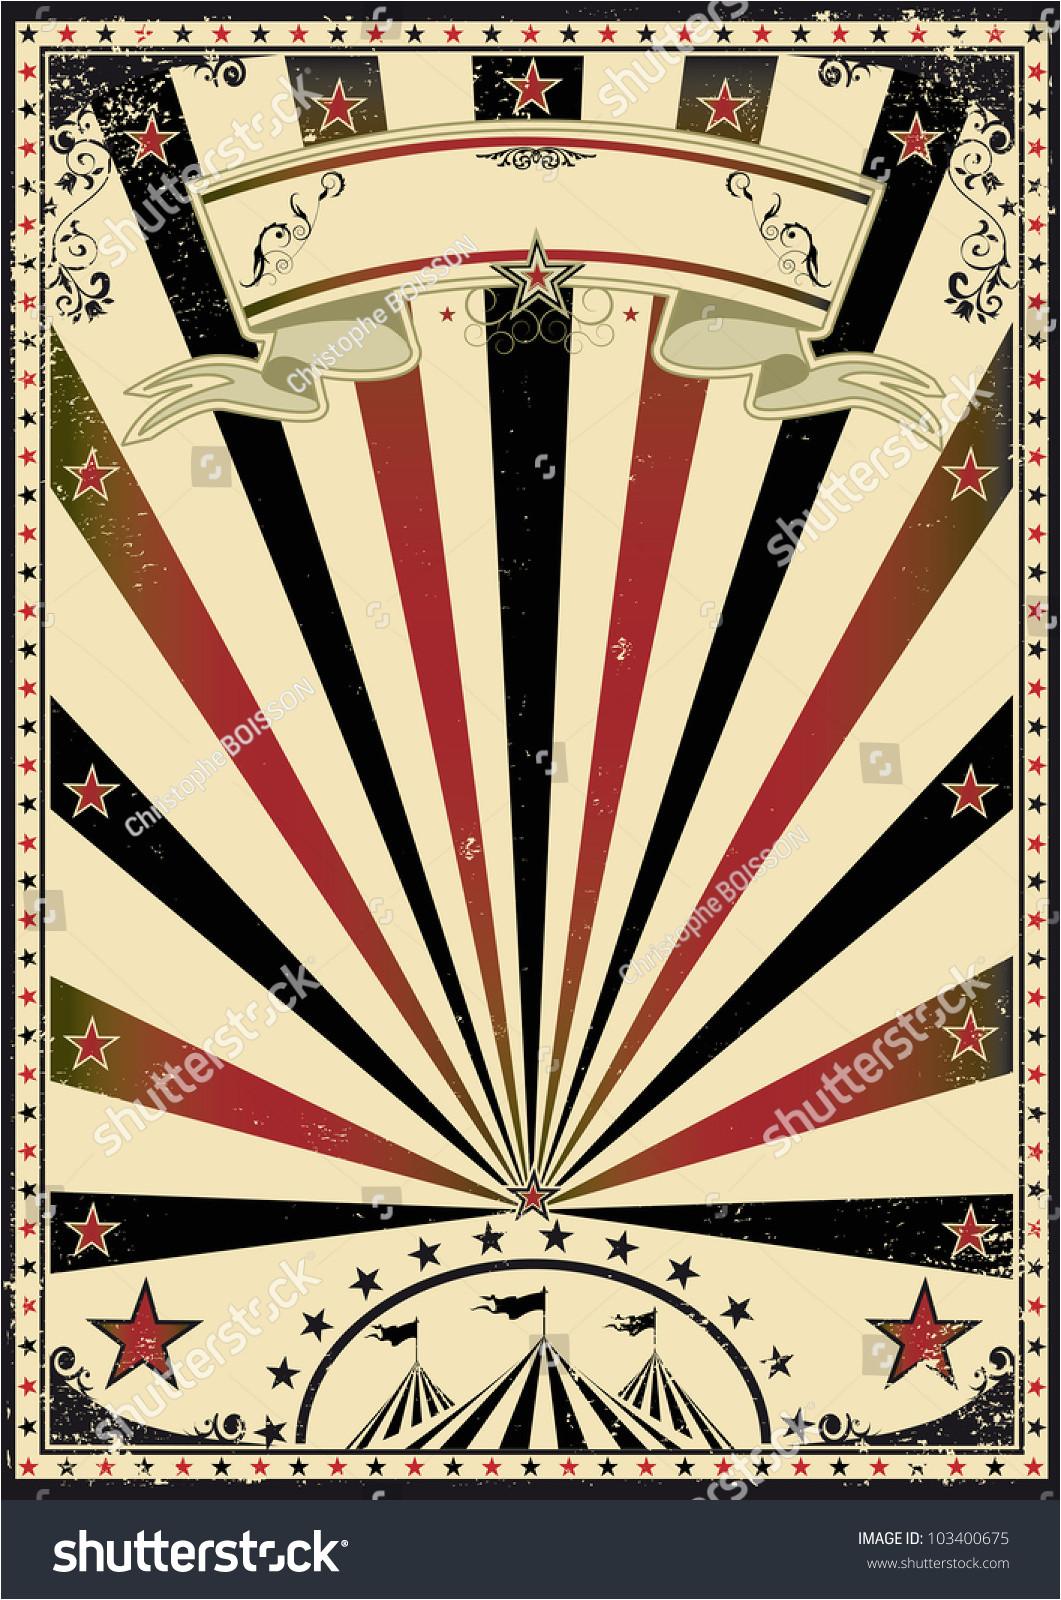 collectionvdwn vintage vaudeville poster